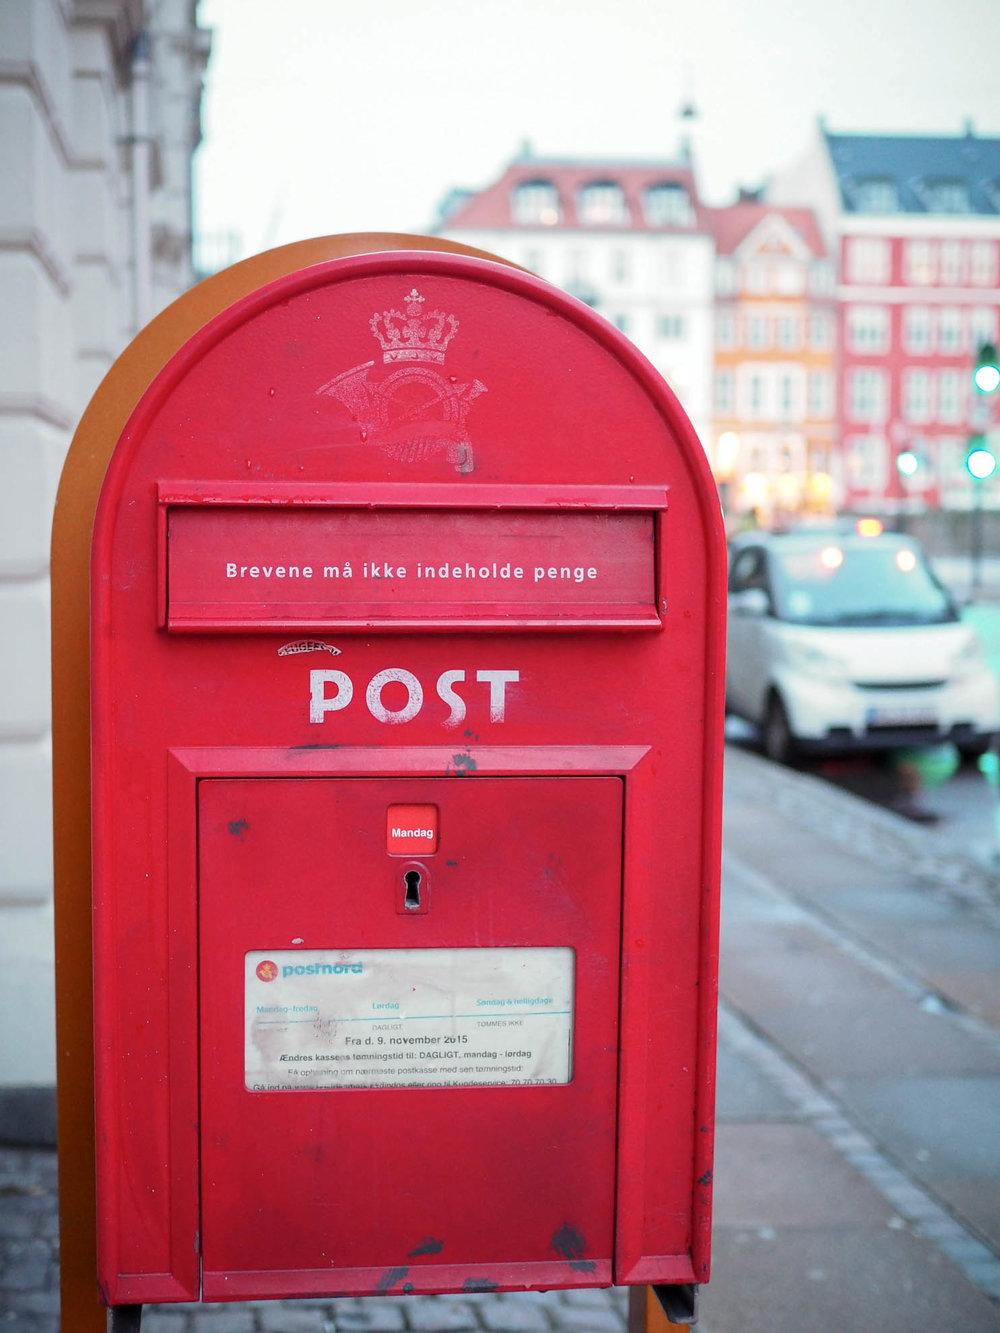 Mailbox on street in Copenhagen, Denmark